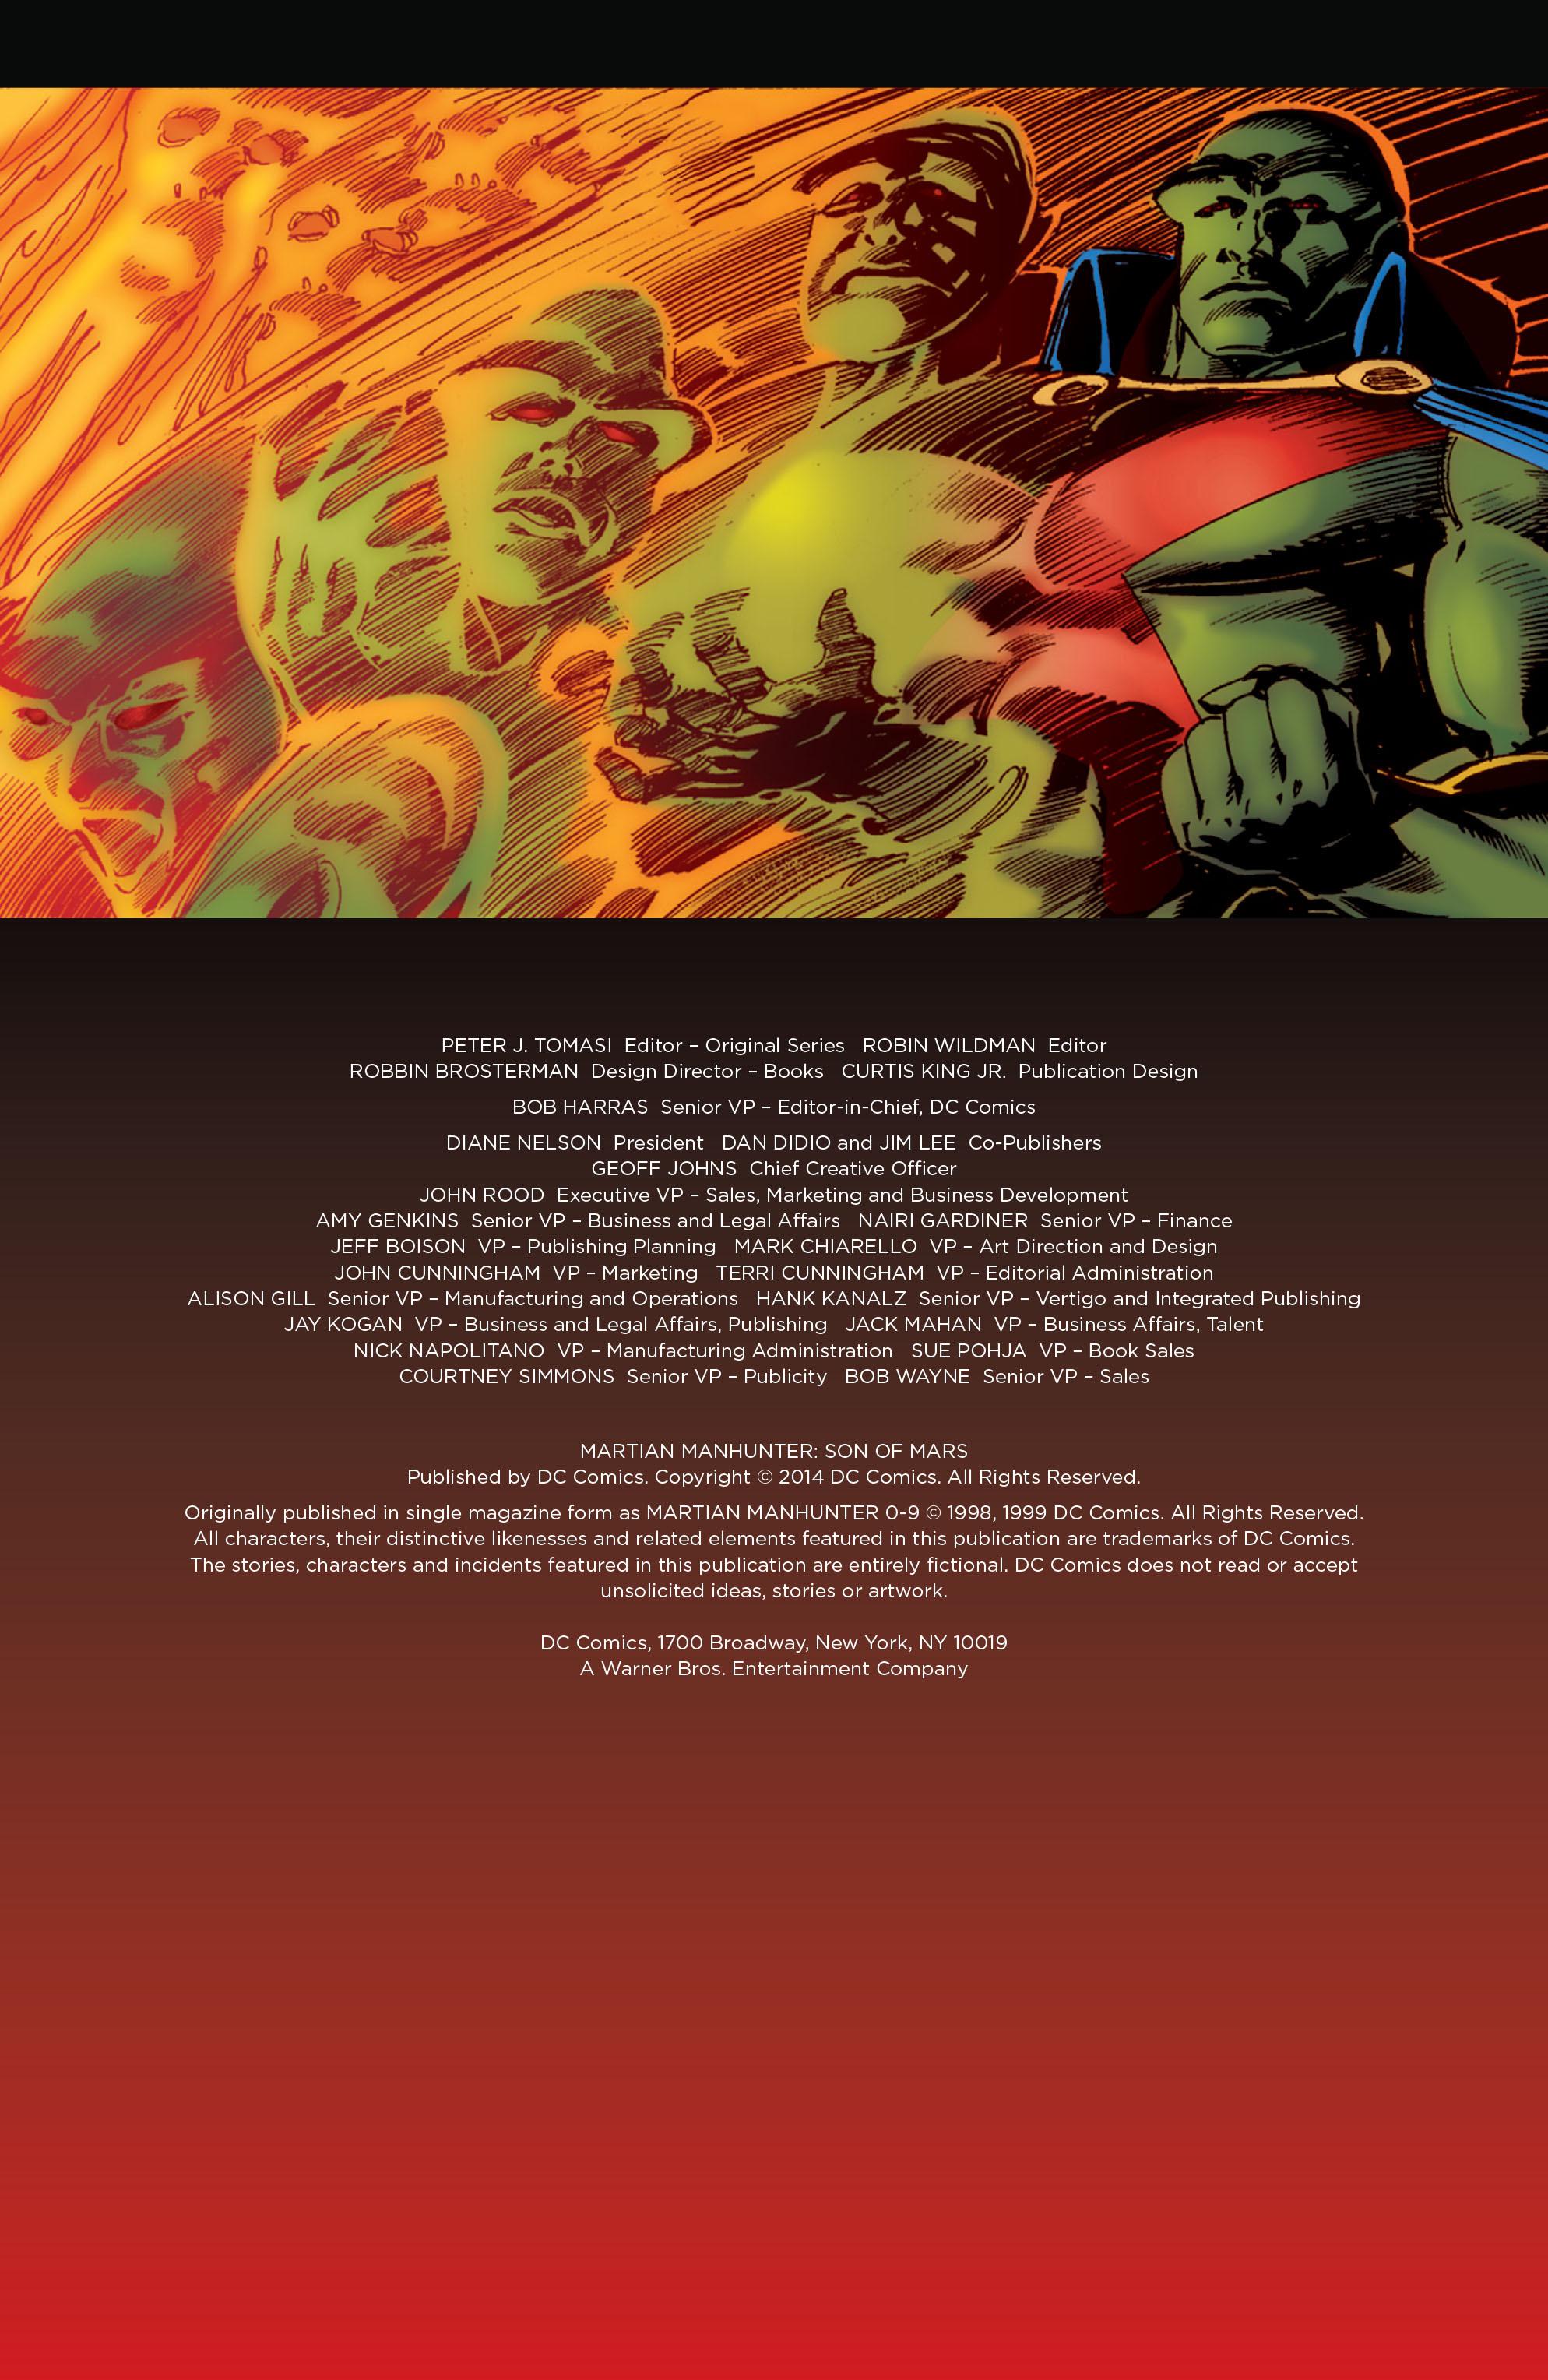 Read online Martian Manhunter: Son of Mars comic -  Issue # TPB - 5